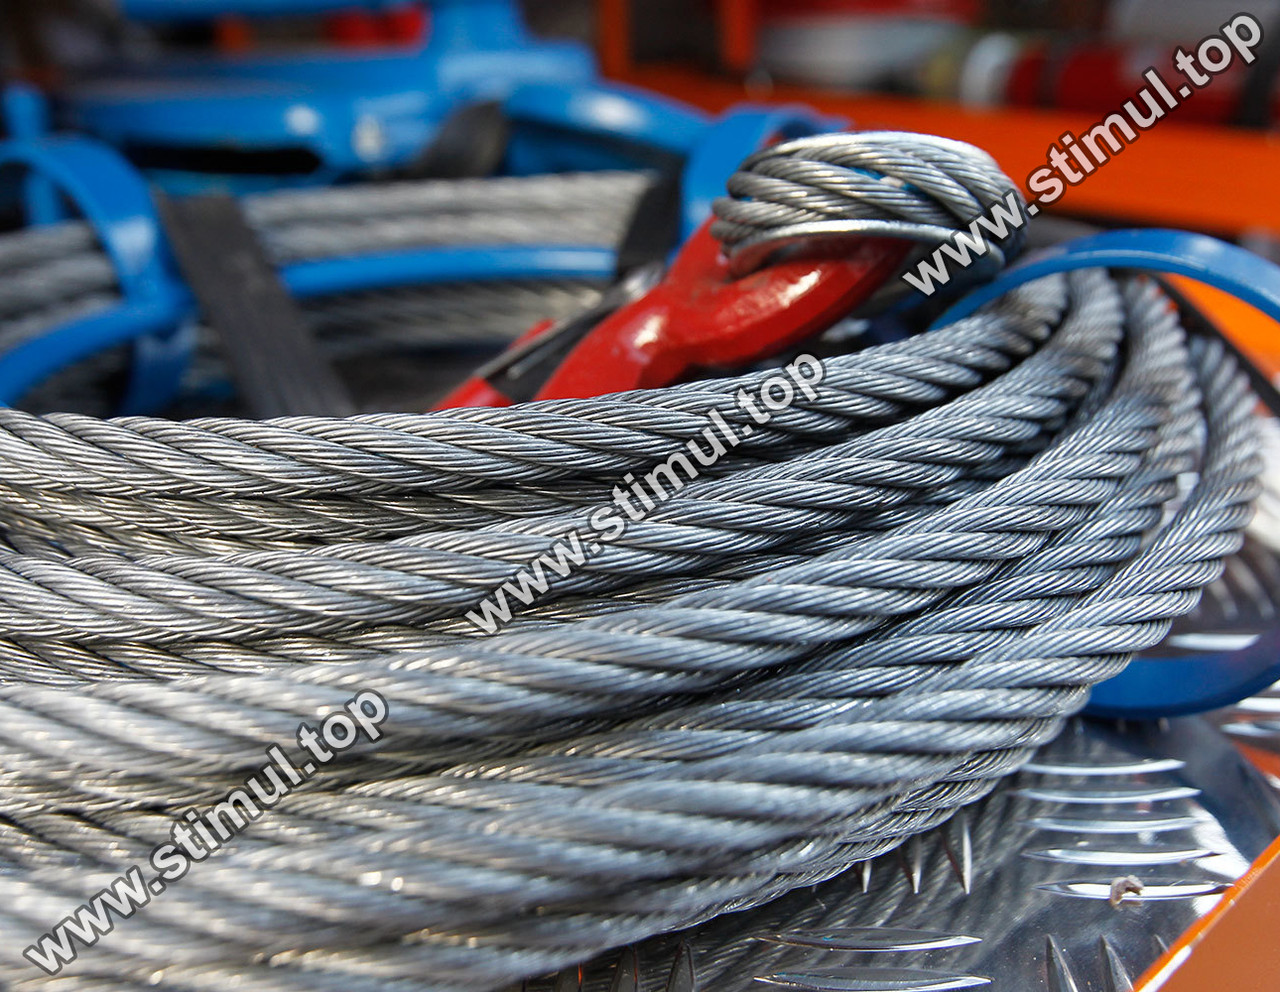 Трос оцинкованный Ø 1 мм (DIN 3052 / 1х7)   Сталеві канати оптом   Канат стальной